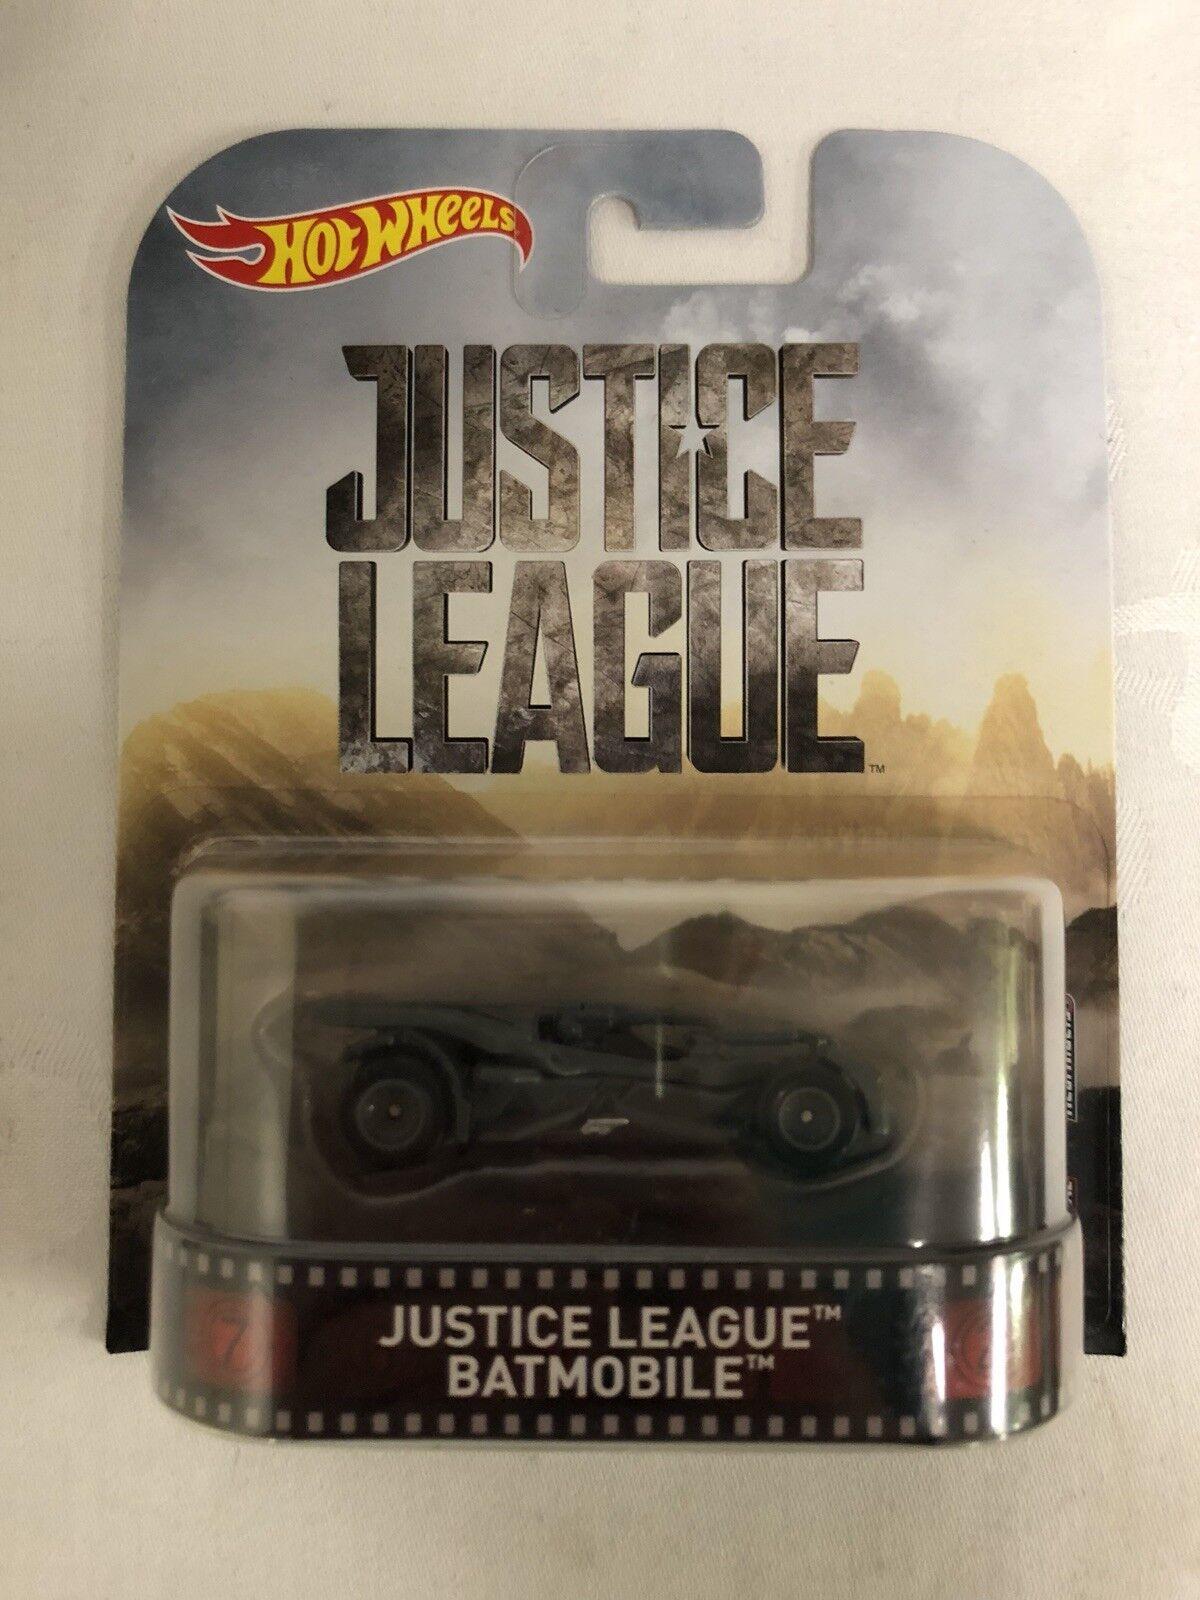 Justice League Batmobile 2017 Retro Hot Wheels 2017